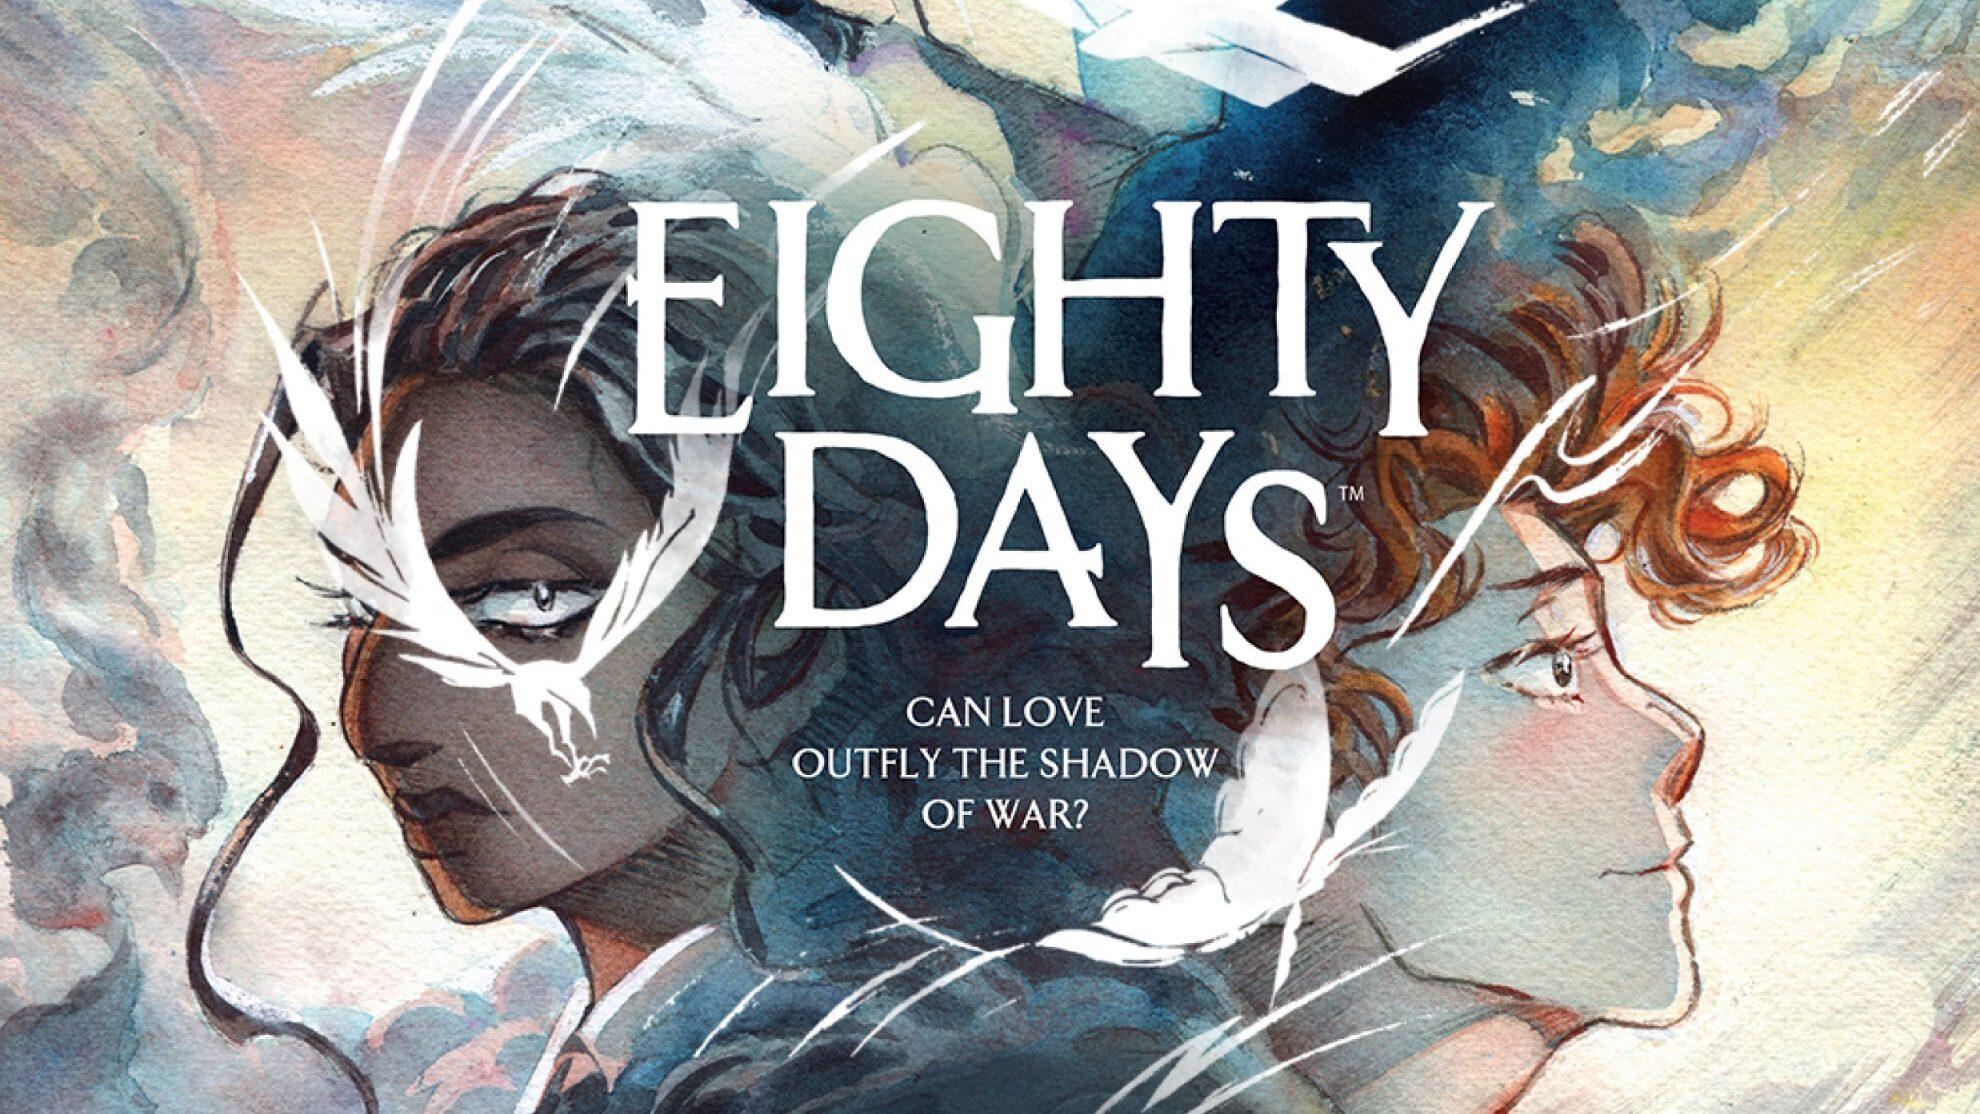 EIGHTY DAYS Graphic Novel